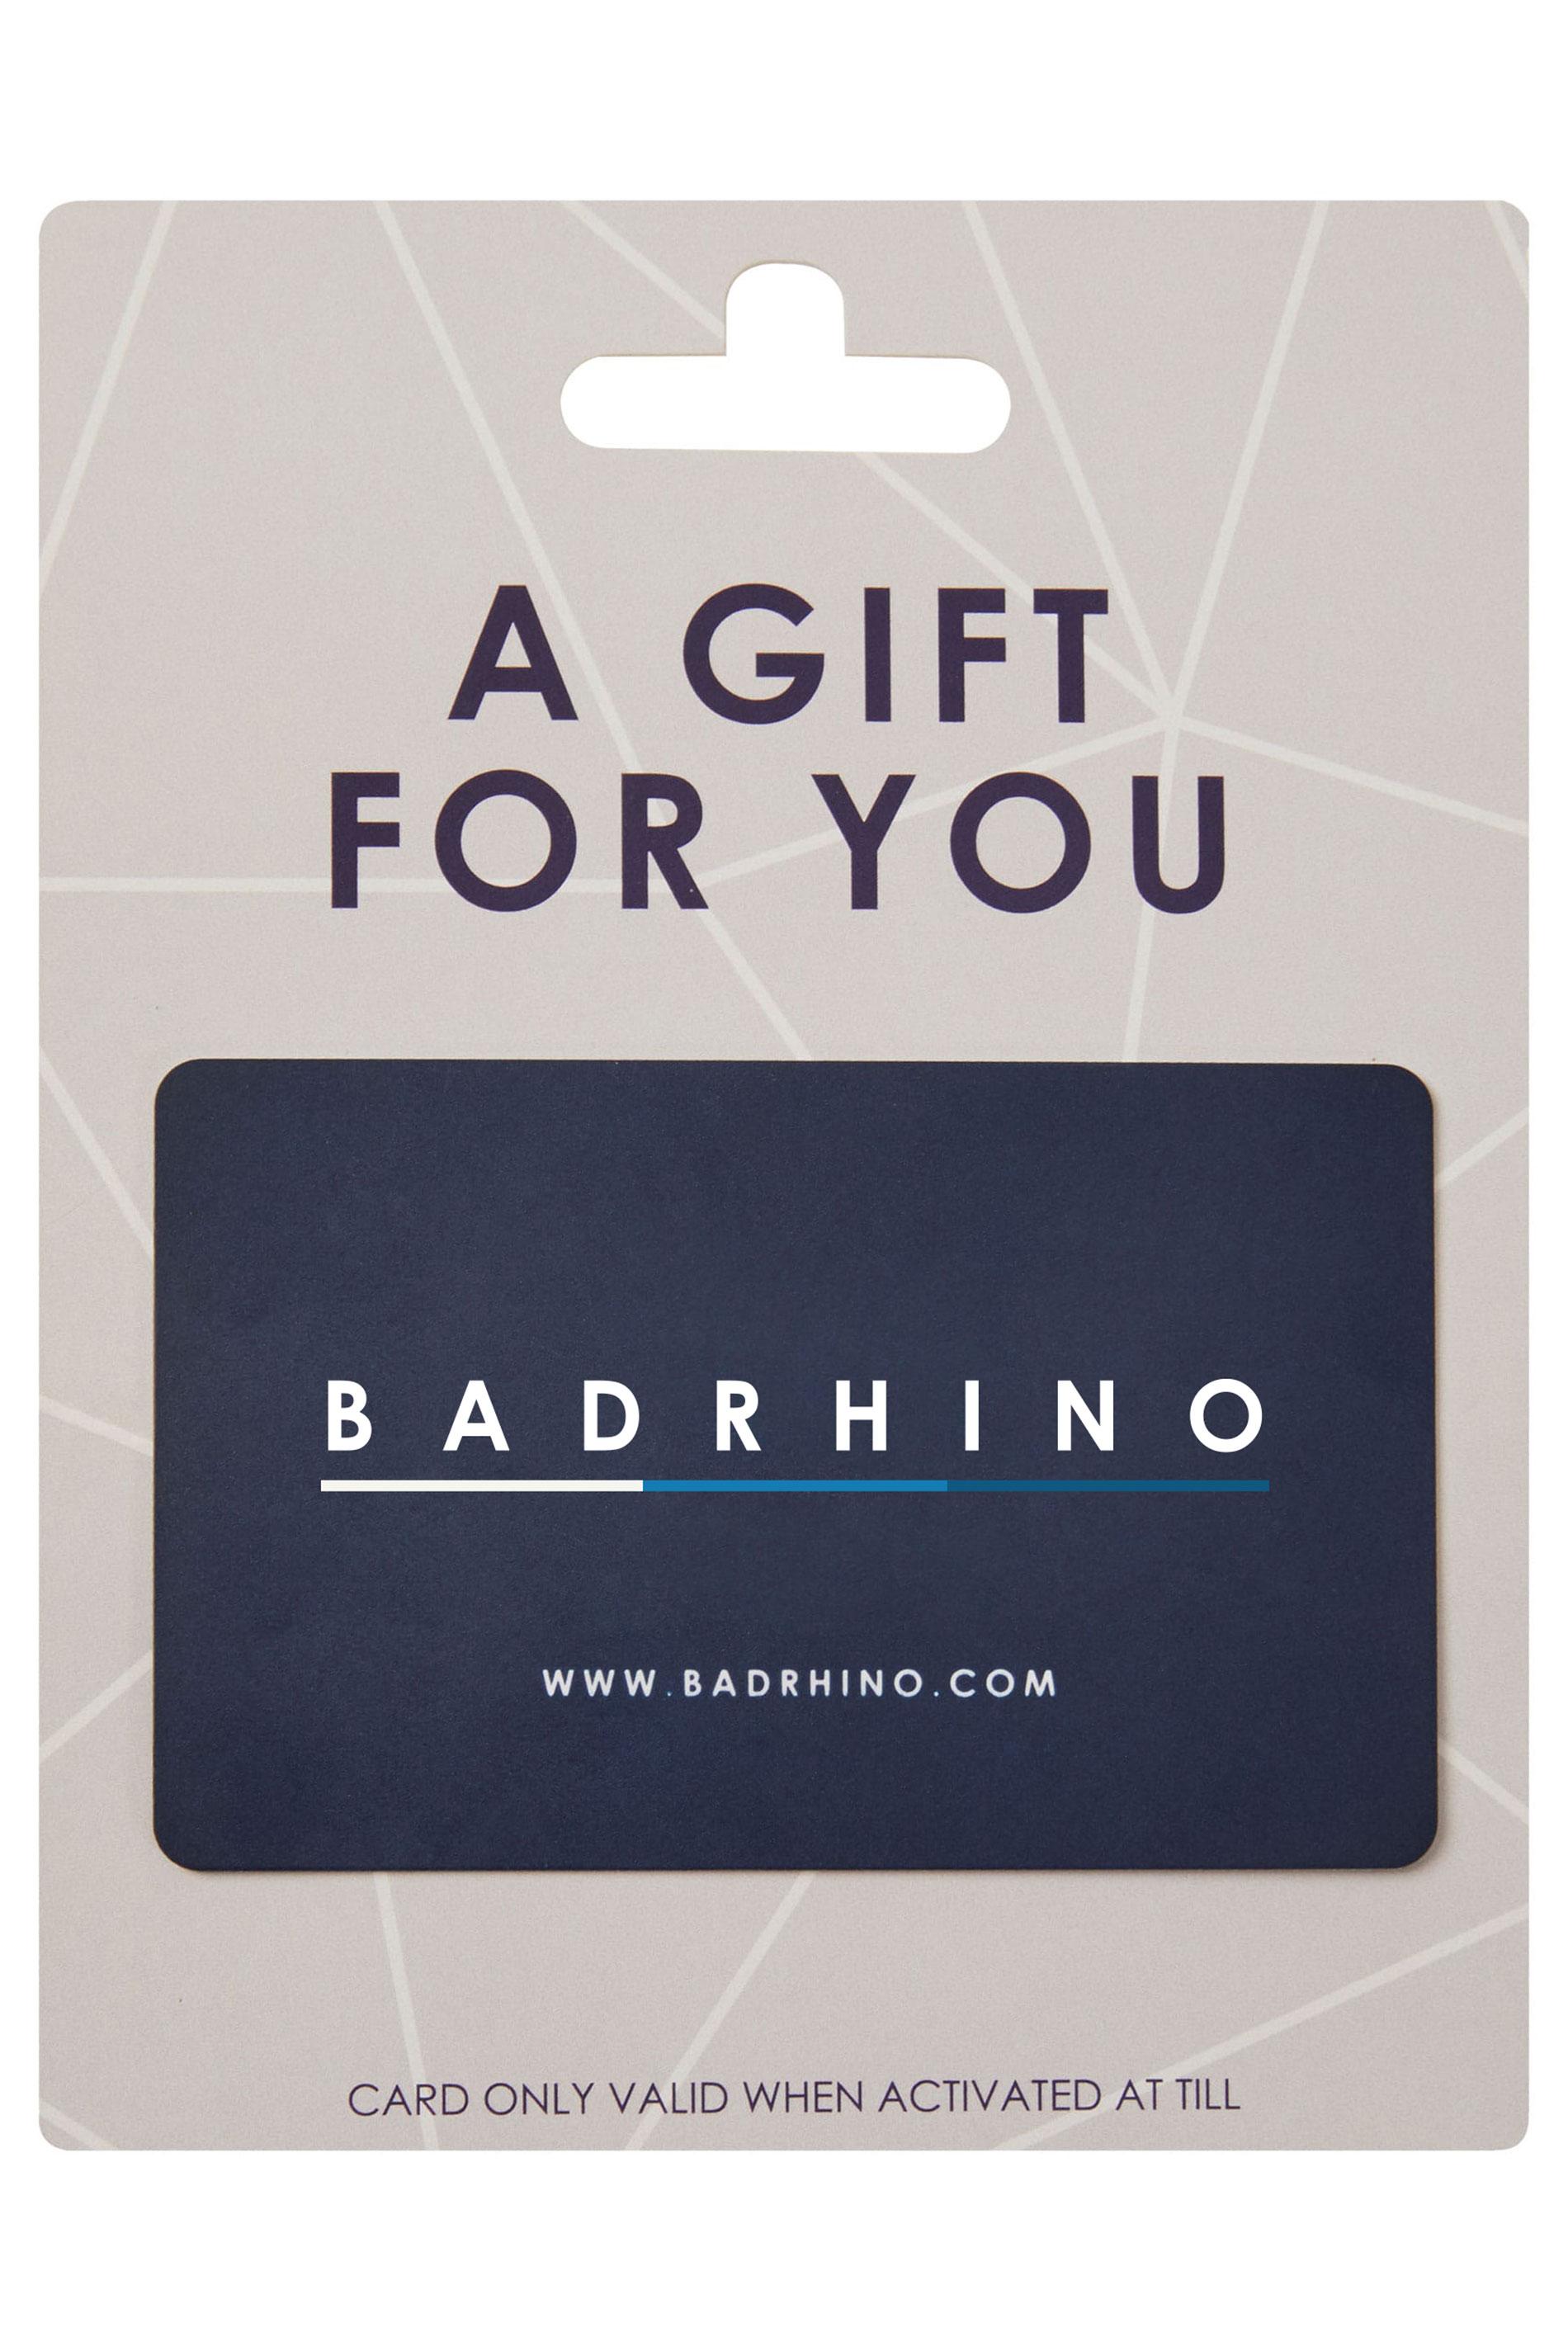 BadRhino Gift Card